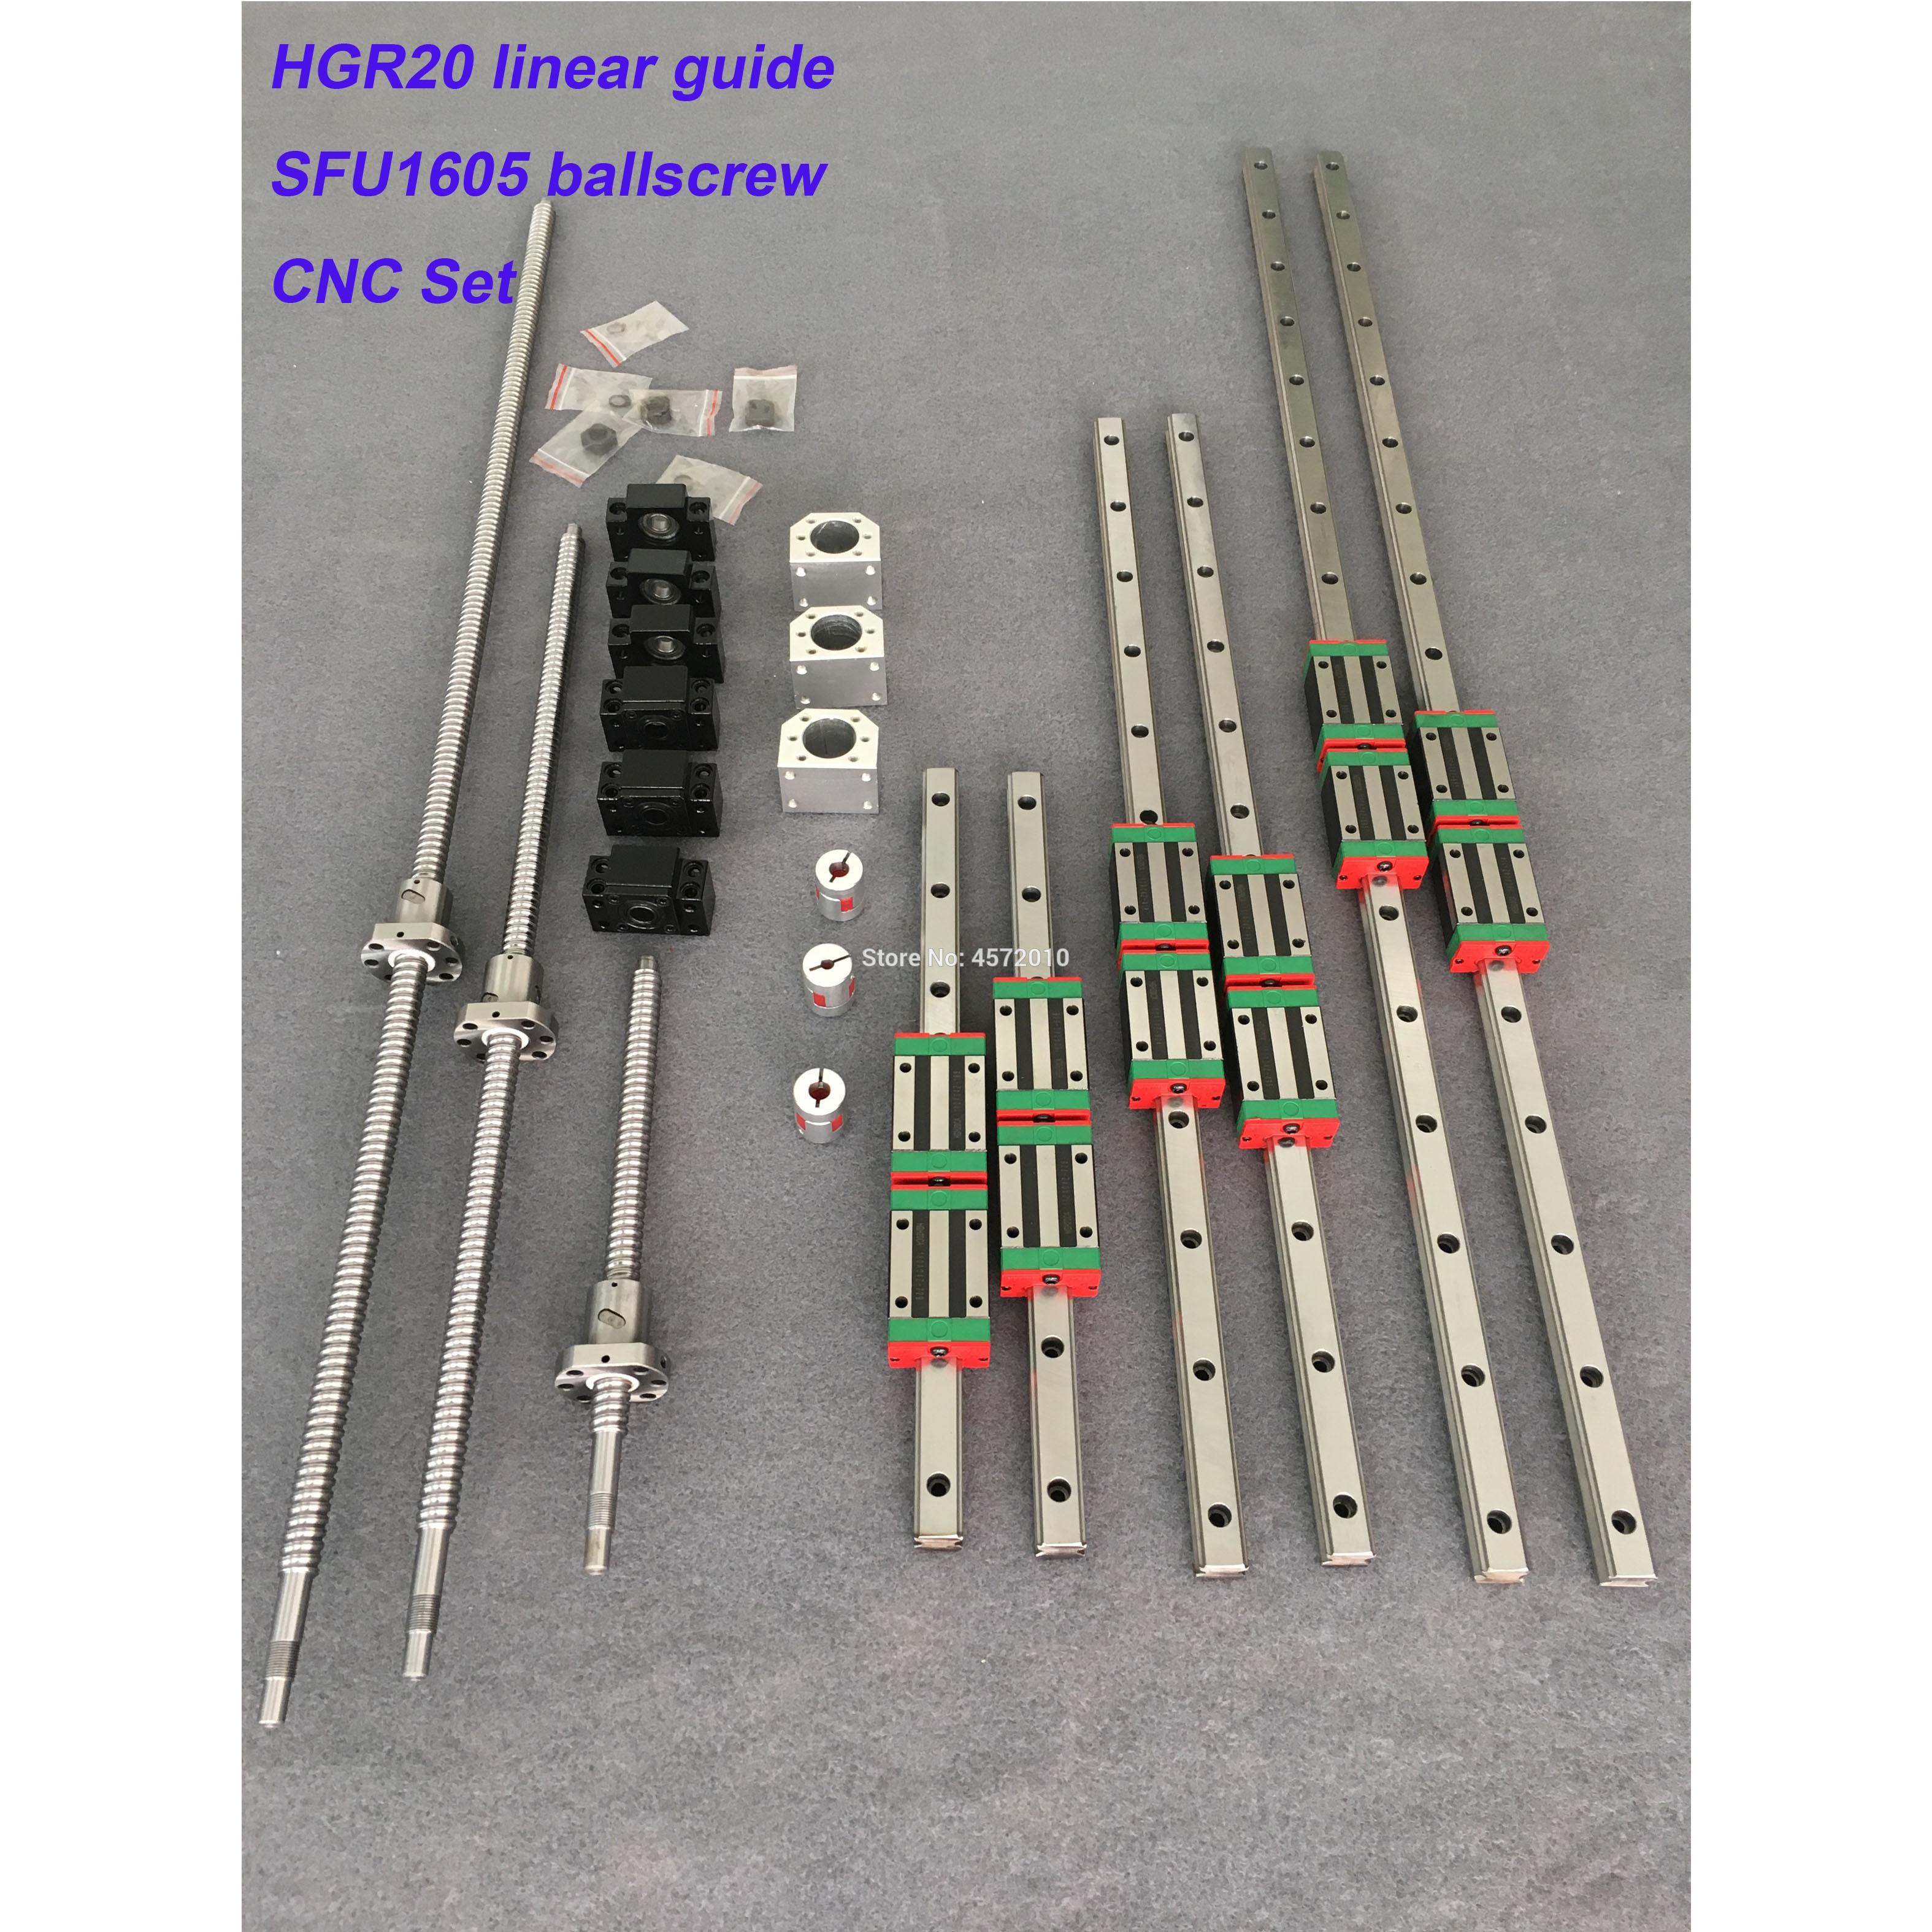 HGR20 - 400/1600 مللي متر + HGH20CA + SFU1605 -400 مللي متر + DFU2005 - 1600 مللي متر + دعم + الجوز الإسكان + اقتران